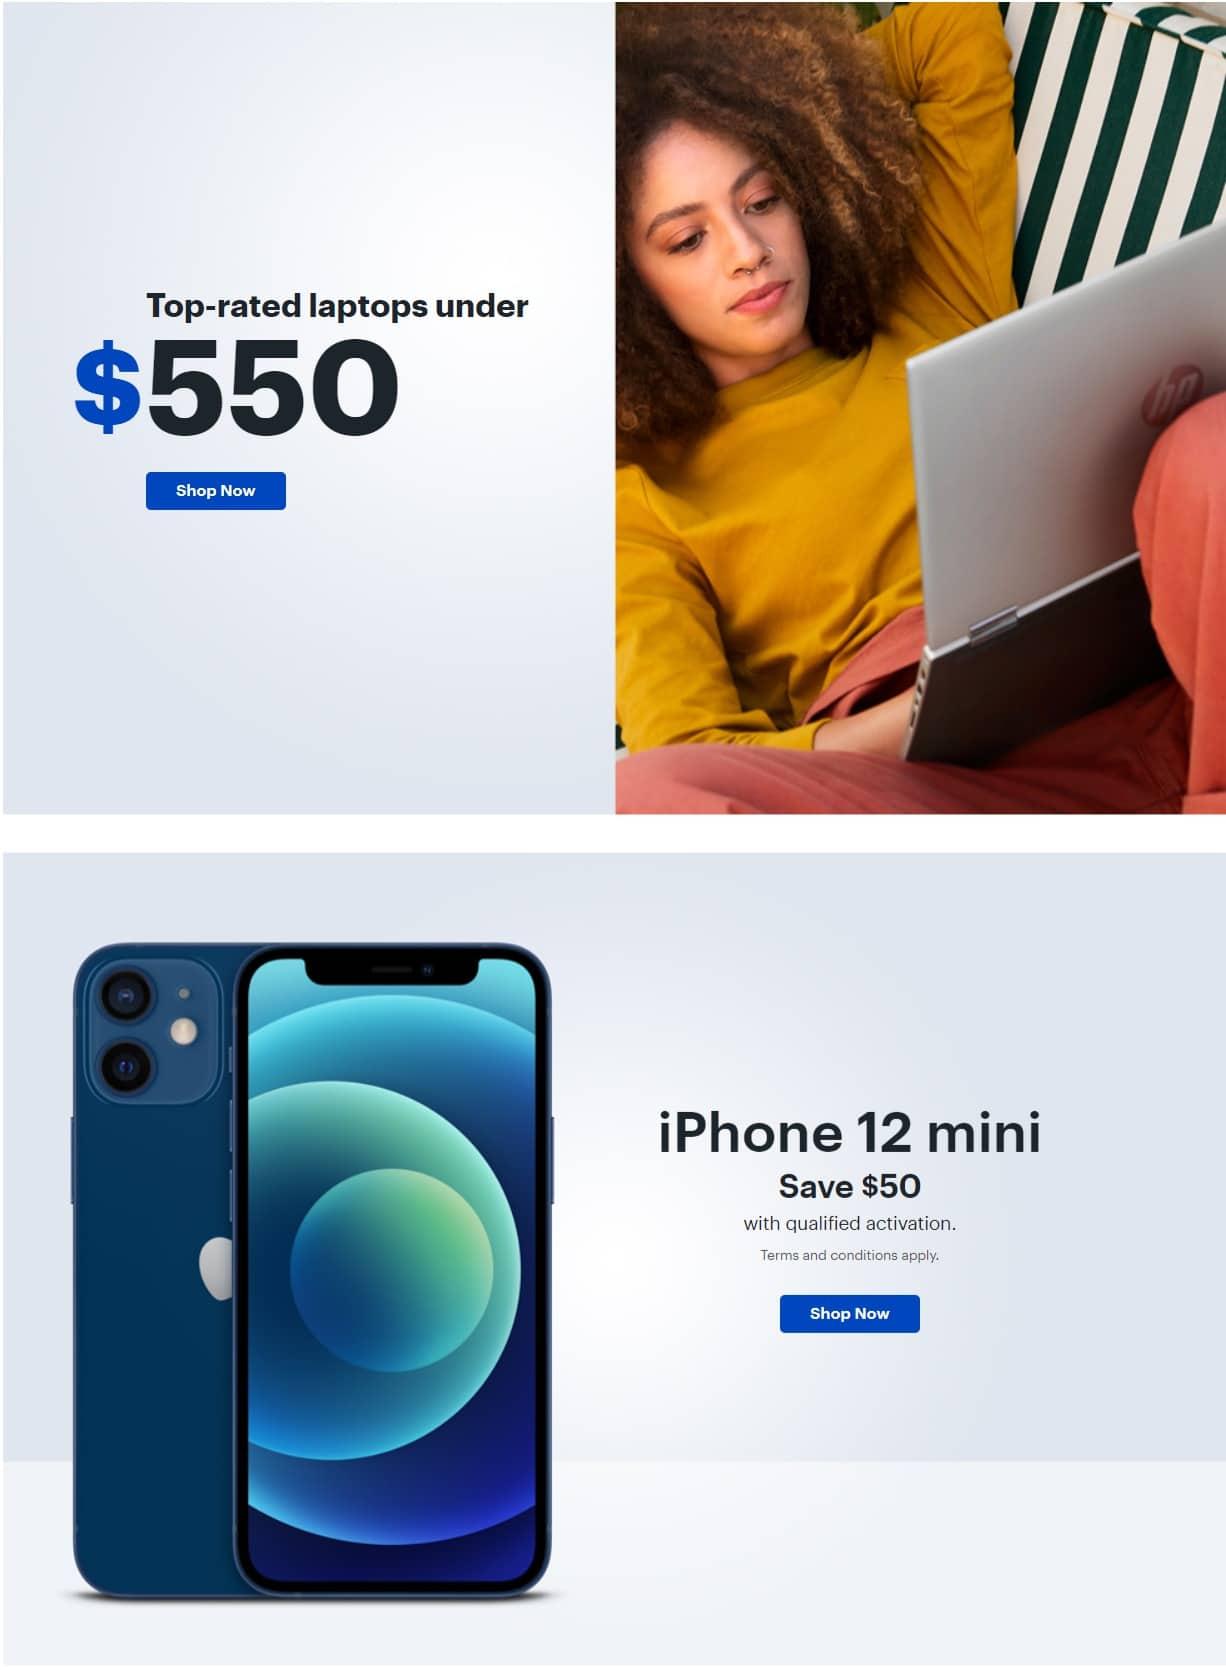 Best Buy Weekly Ad April 12 - April 15, 2021